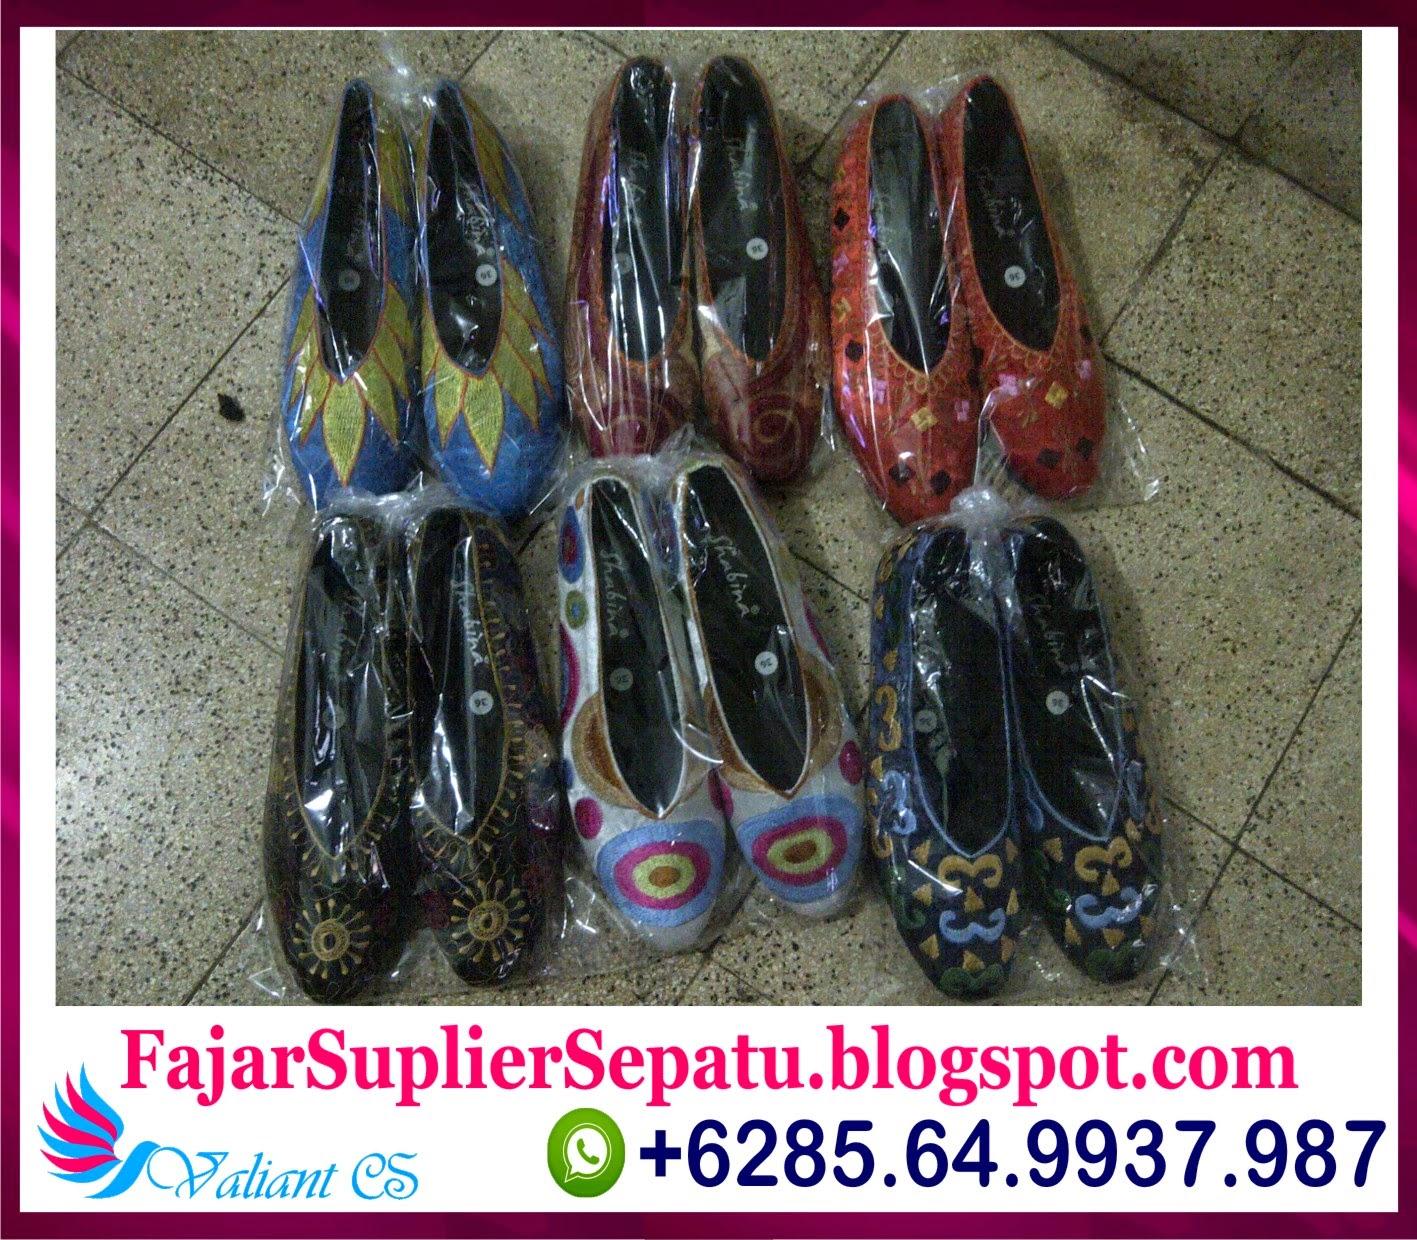 Sepatu Bordir Murah, Grosir Sepatu Bordir Bali, Grosir Sepatu Bordir Malang, +62.8564.993.7987